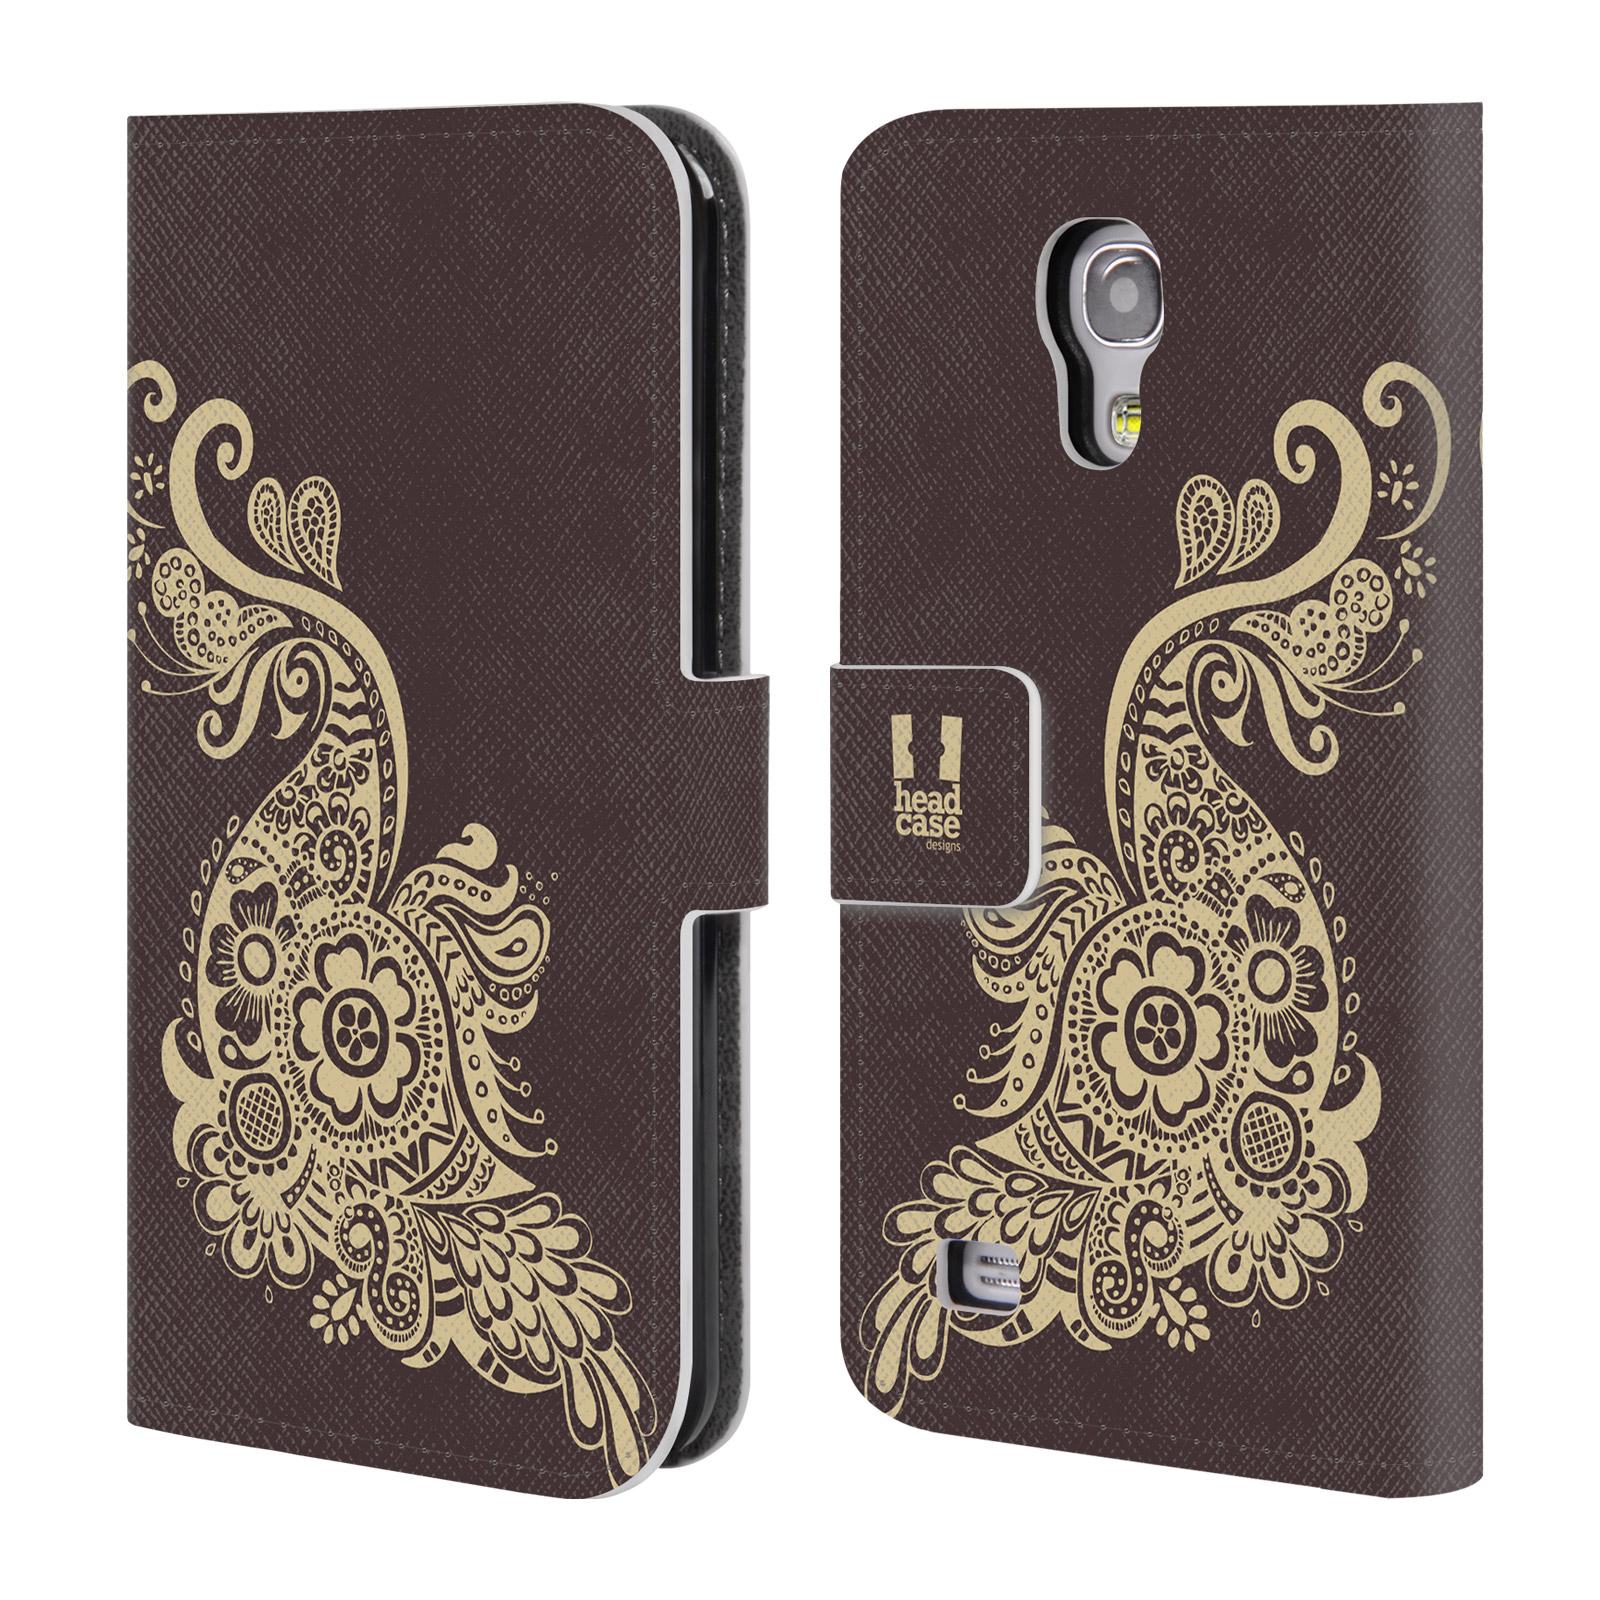 HEAD CASE Flipové pouzdro pro mobil Samsung Galaxy S4 MINI / S4 MINI DUOS Hena kresba paví pírko